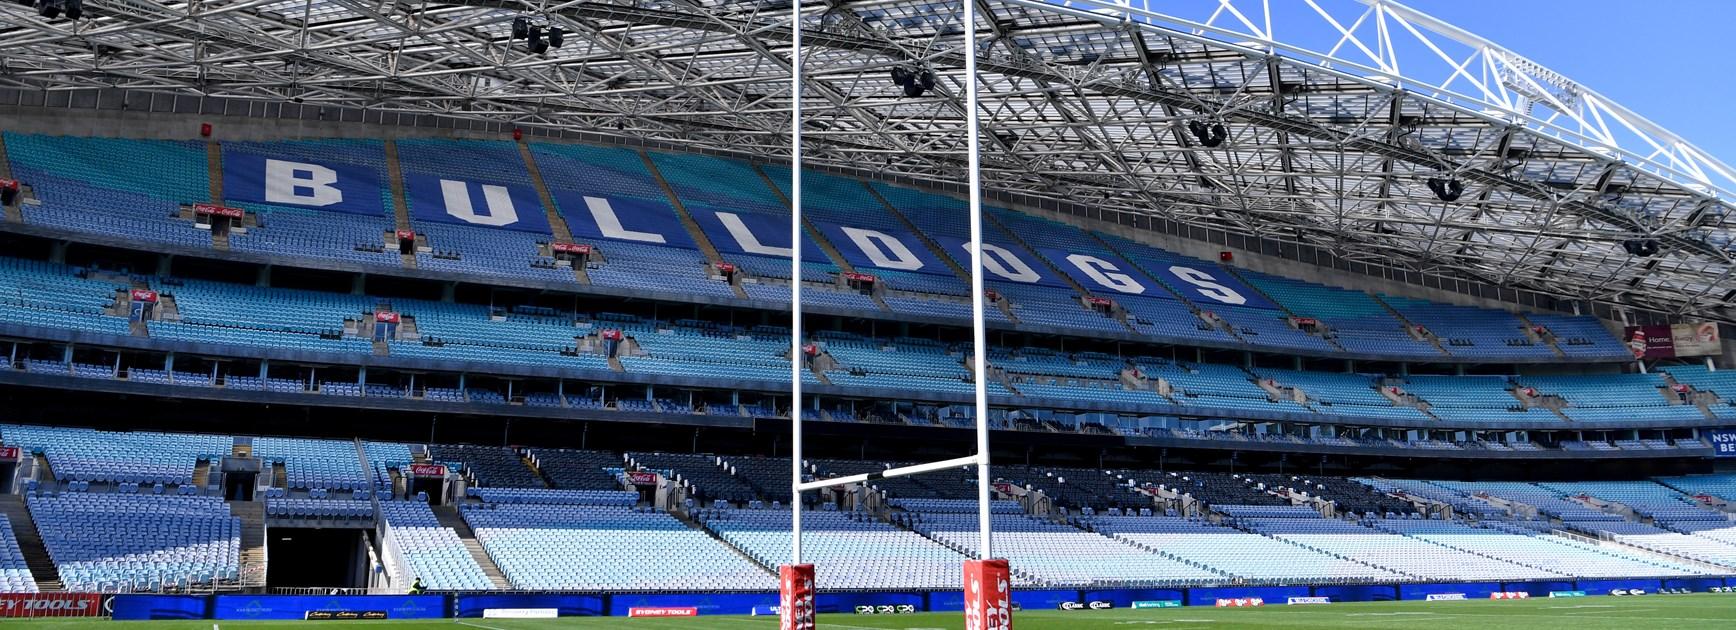 Bulldogs move Round Five match to Stadium Australia